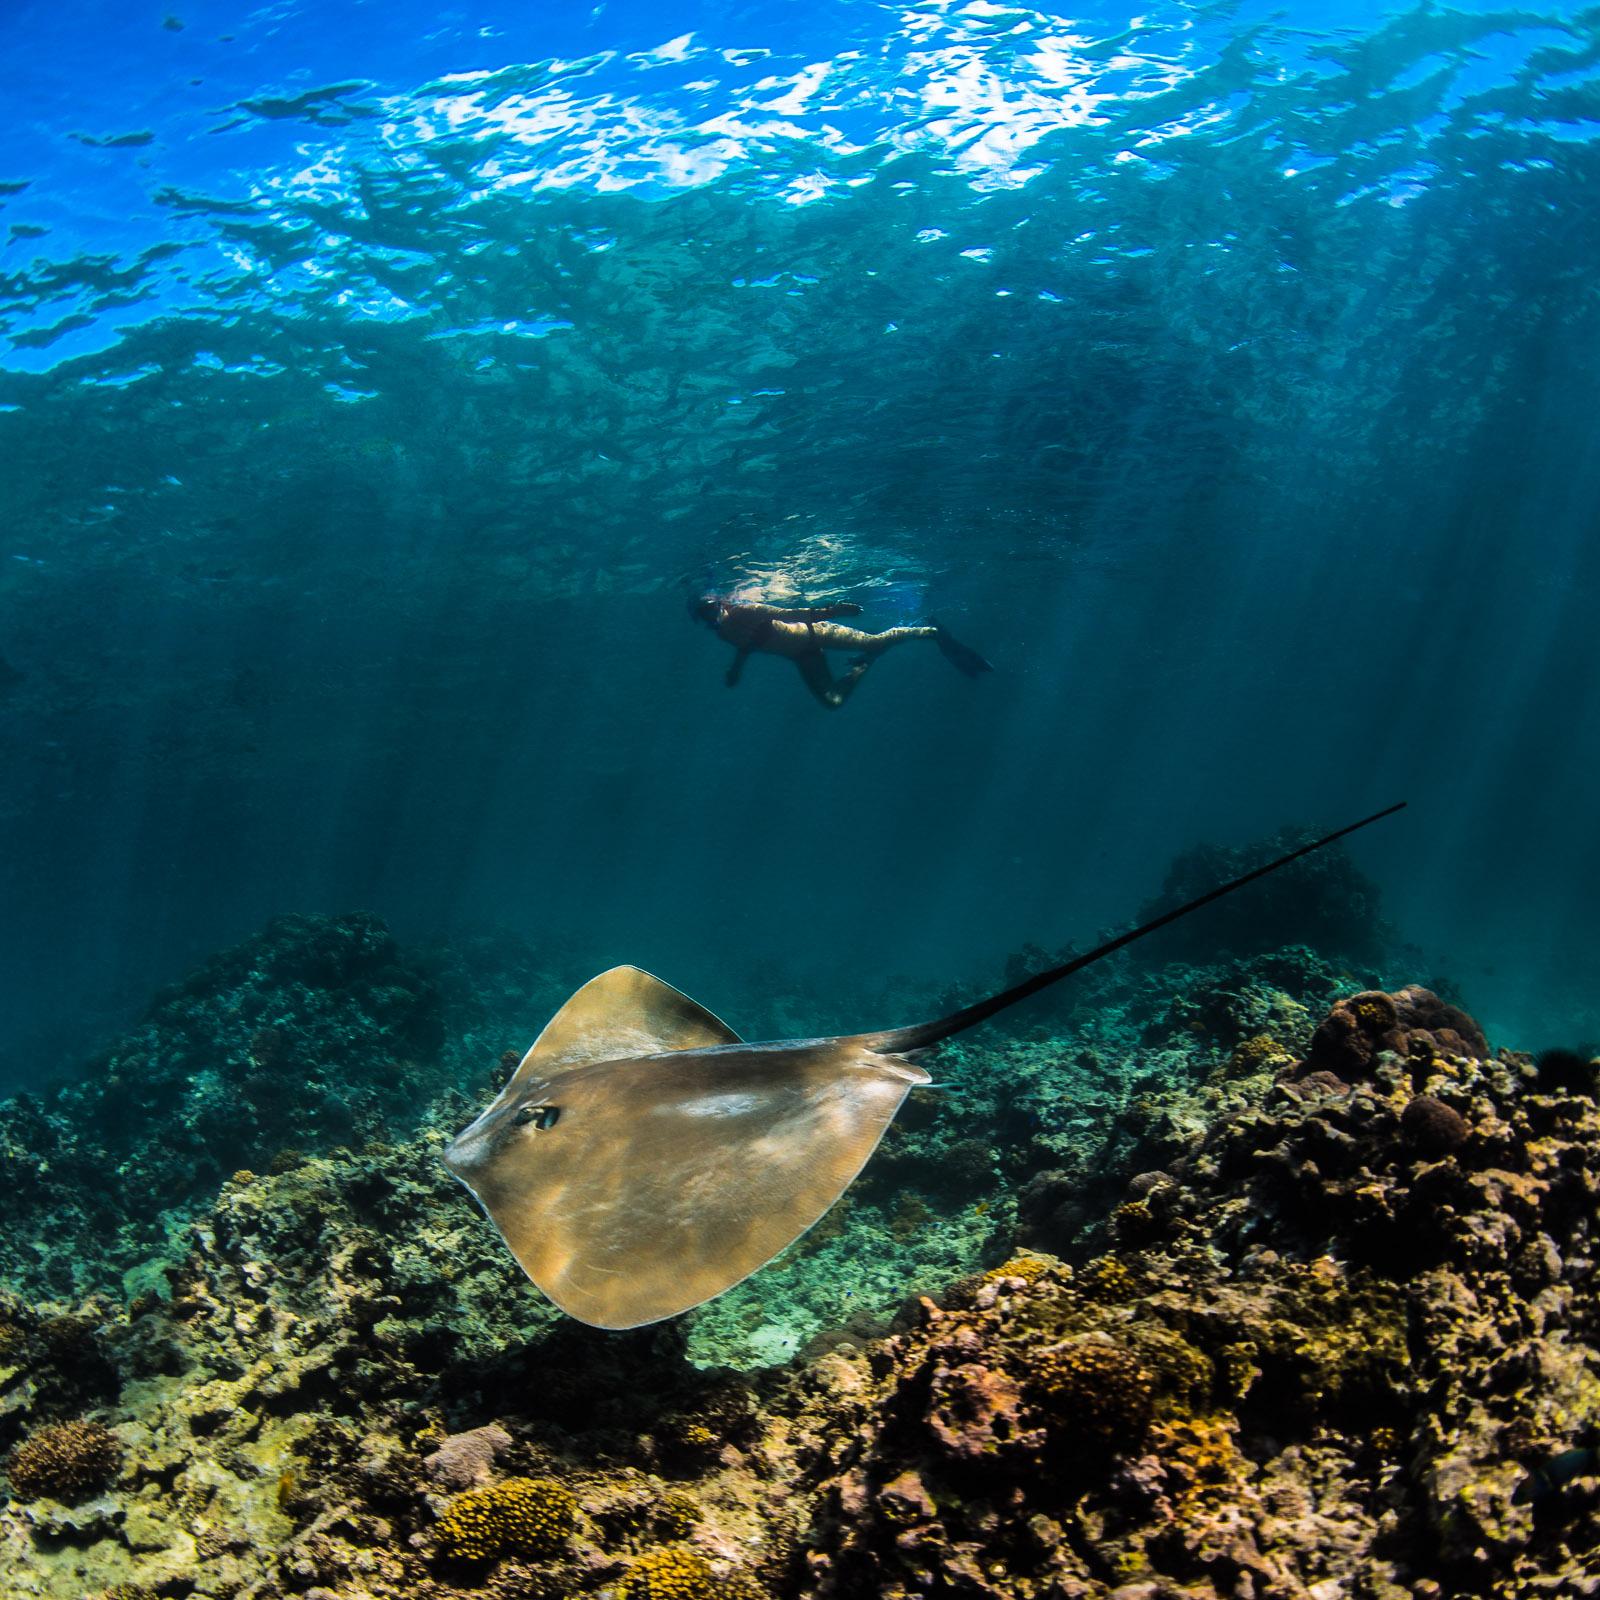 stingray, seychelles, la digue, underwater, snorkeling, diving, travel, adventure, wanderlust, underwater photo, underwater photographer, photographer, seychellerna, undervattensfoto, undervattensfotograf, fotograf, rocka, anhede